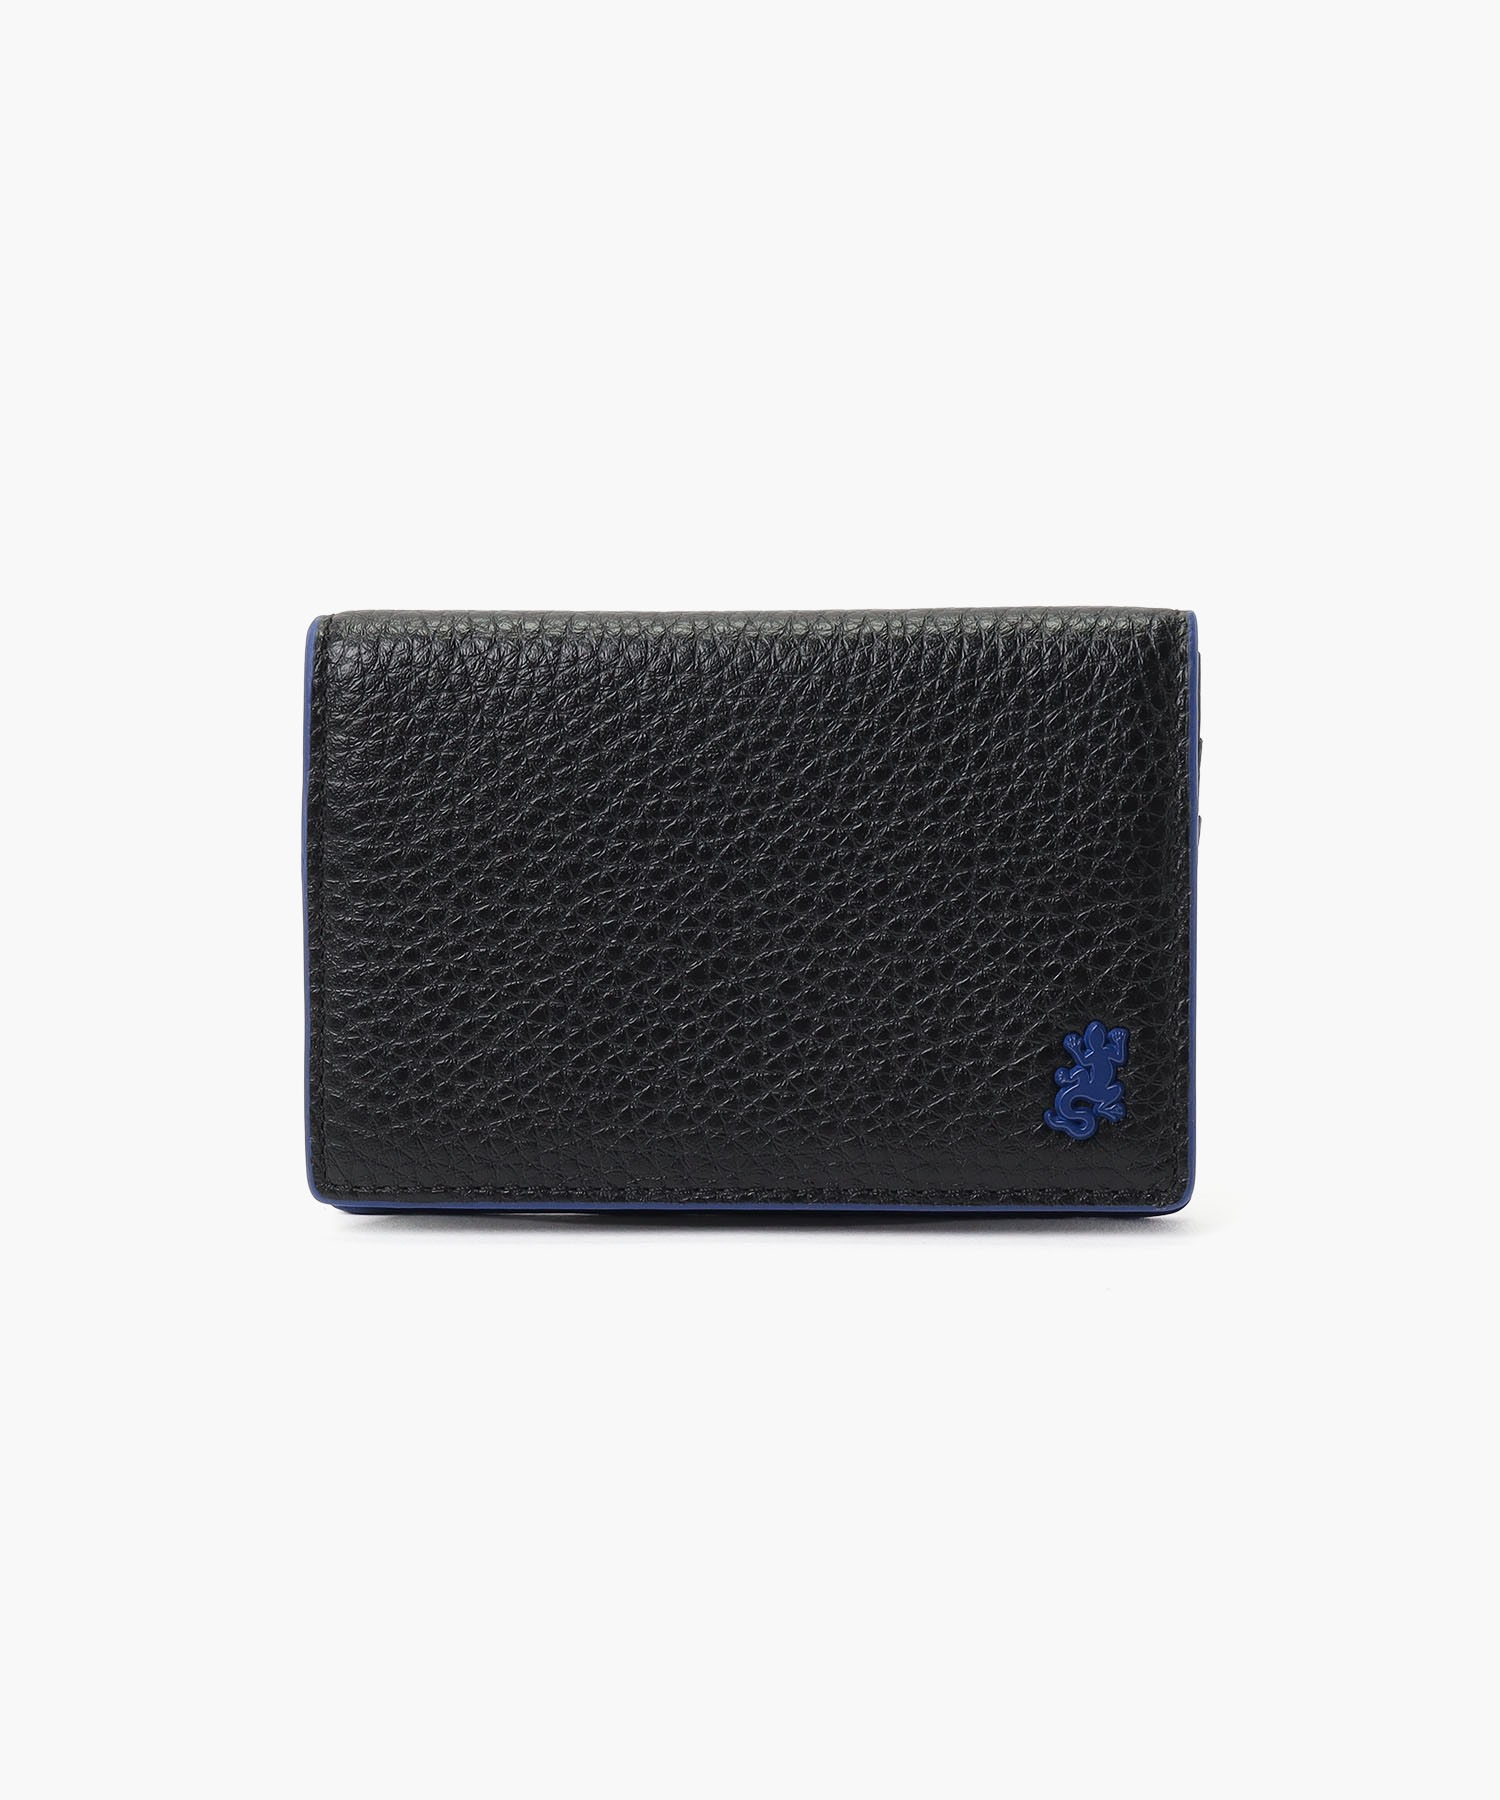 RAH06-07 カードケース